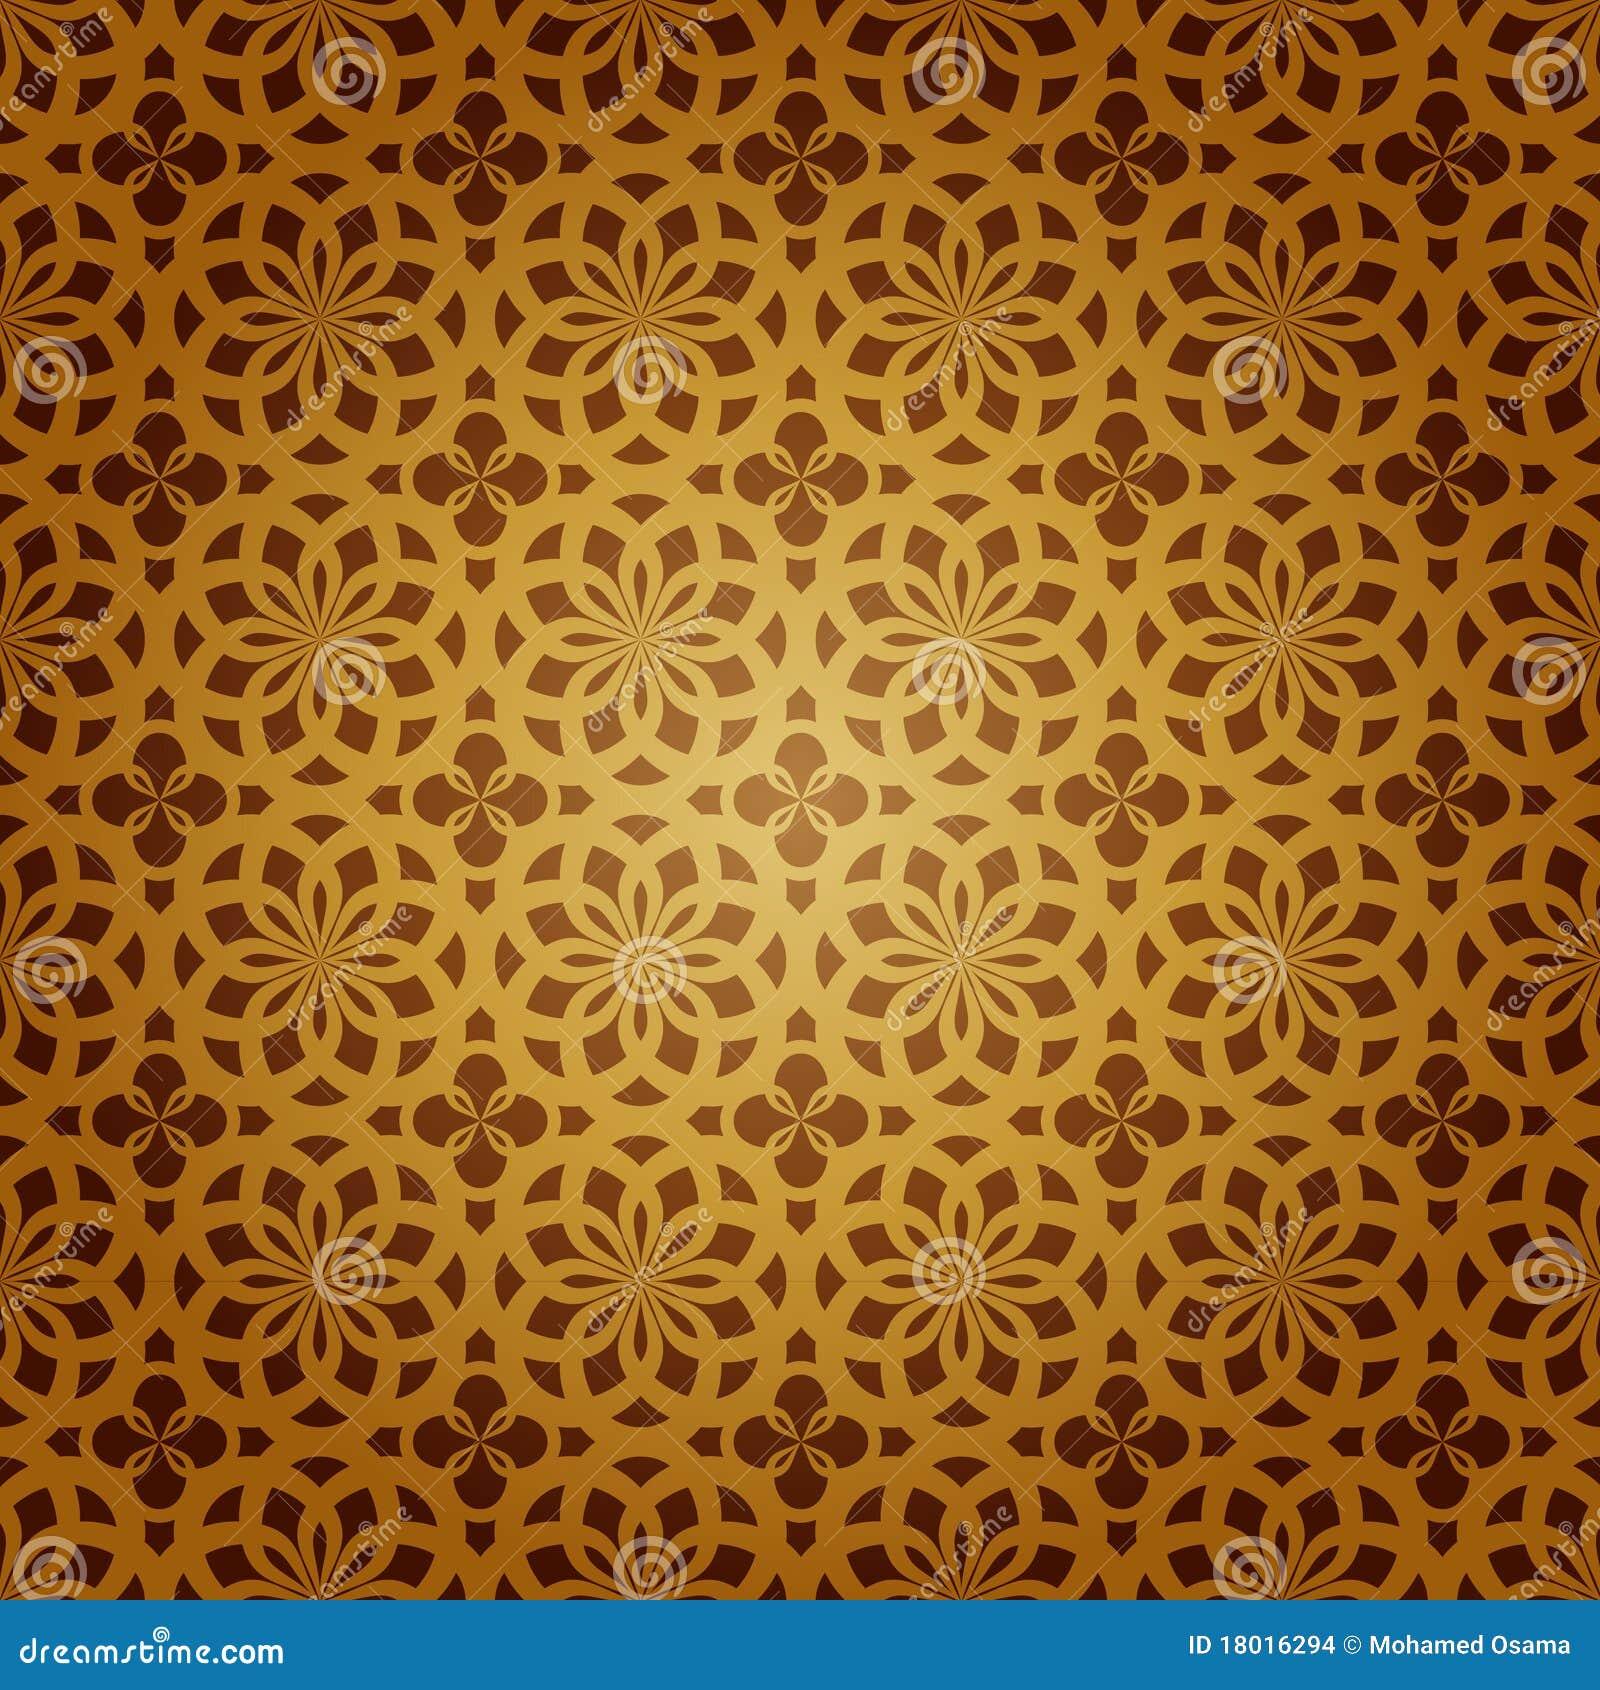 Islamic geometric patterns  IPFS